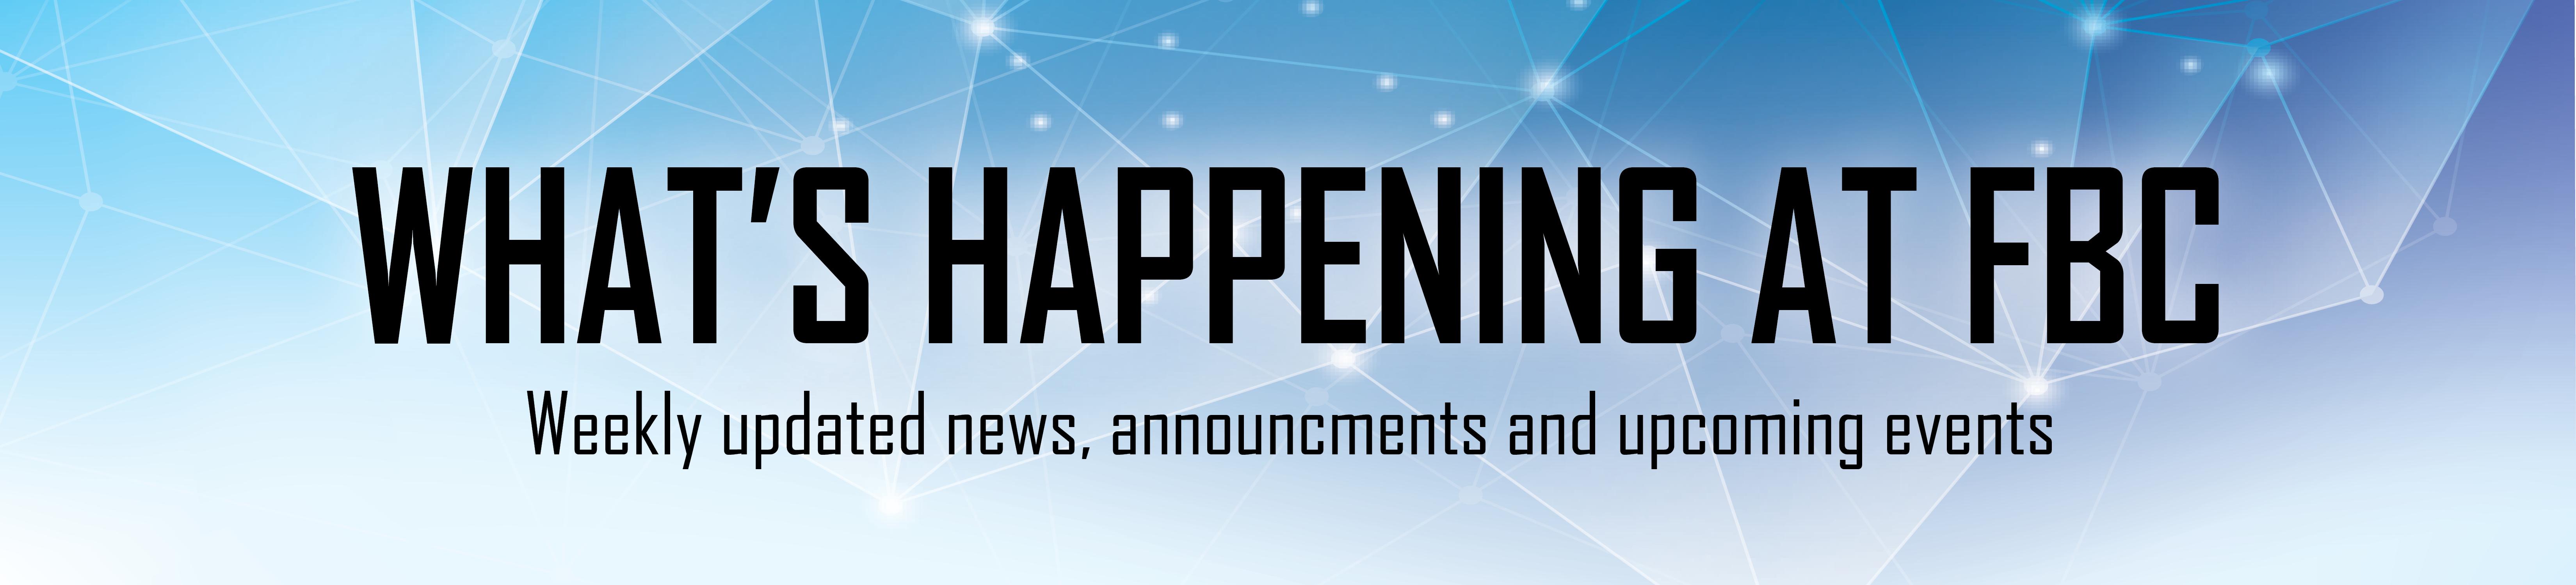 news-webpage-header-1601584186.jpg